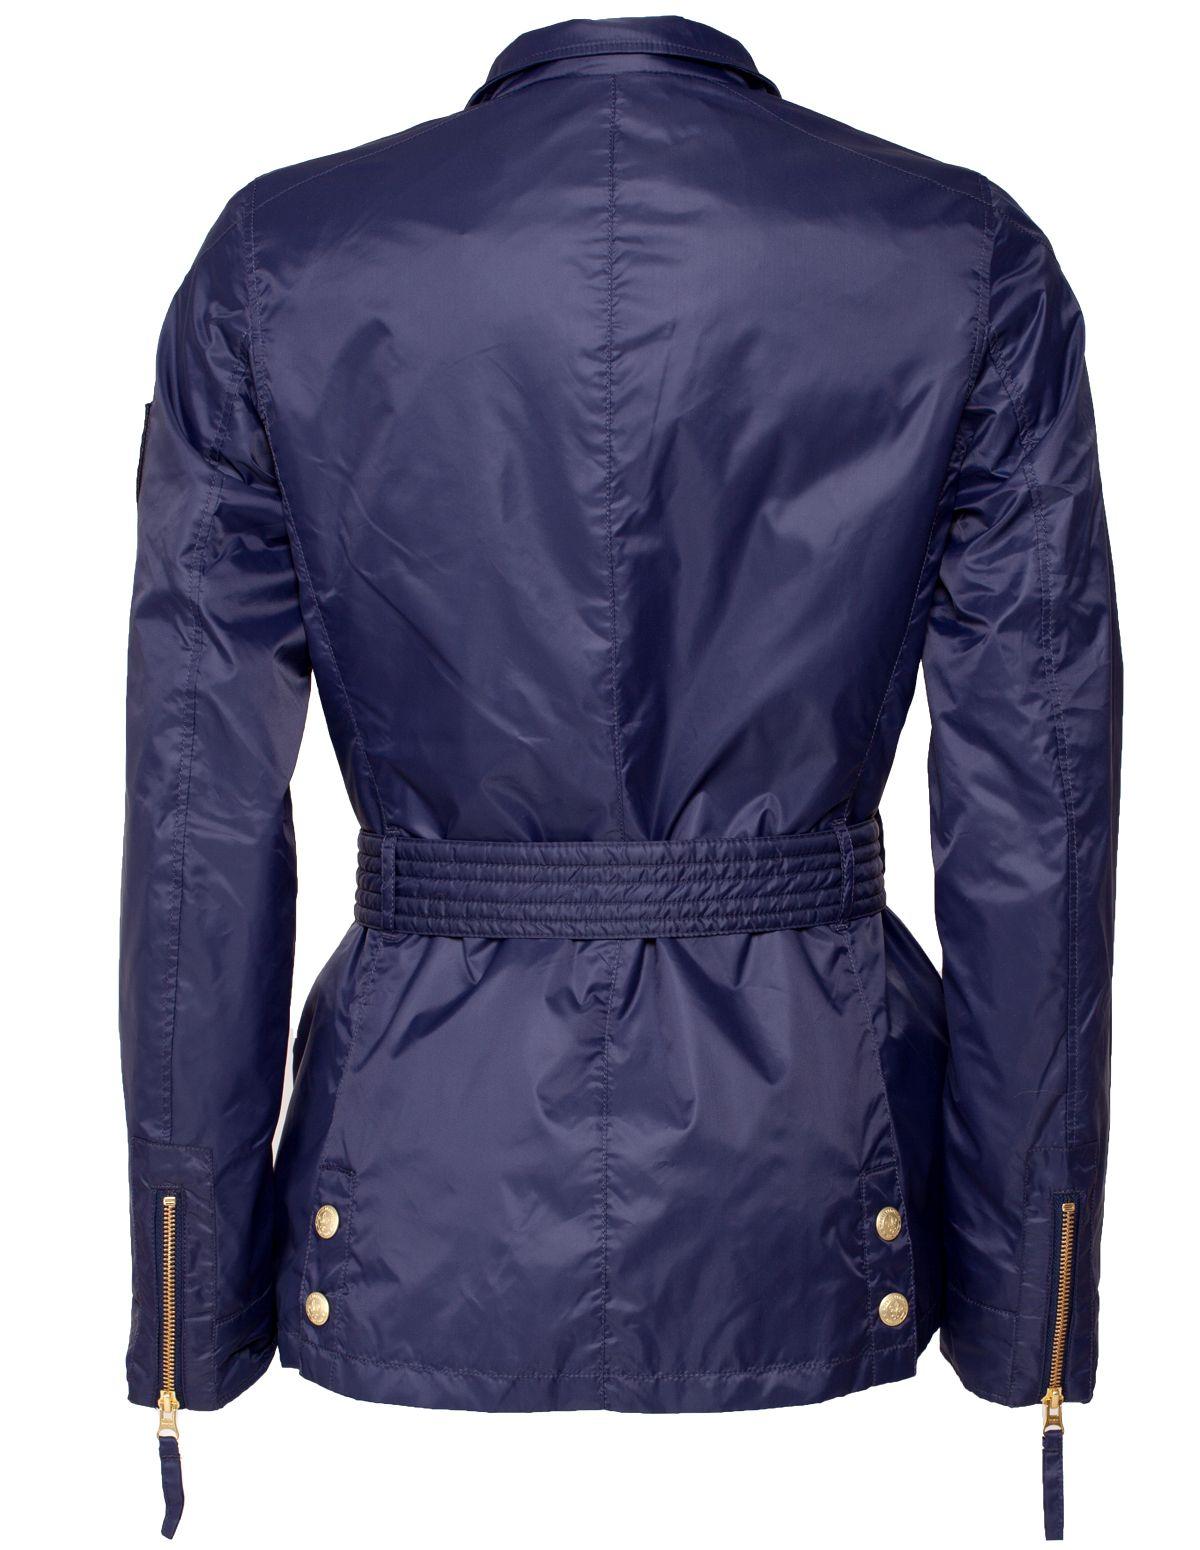 Morris Lady Hepburn Jacket Navy | Jacka, Kappor